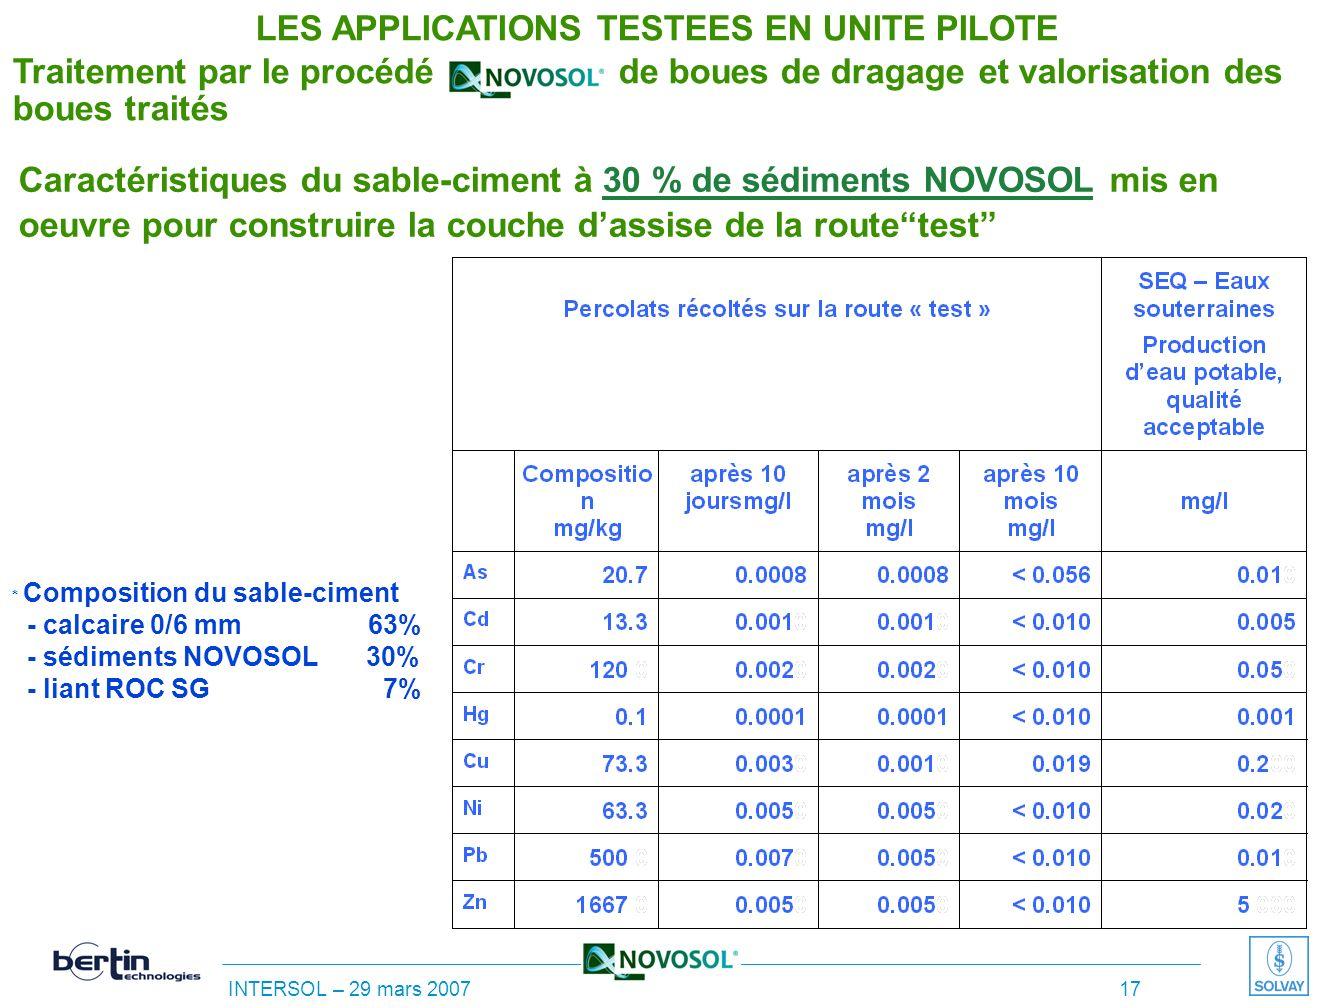 LES APPLICATIONS TESTEES EN UNITE PILOTE